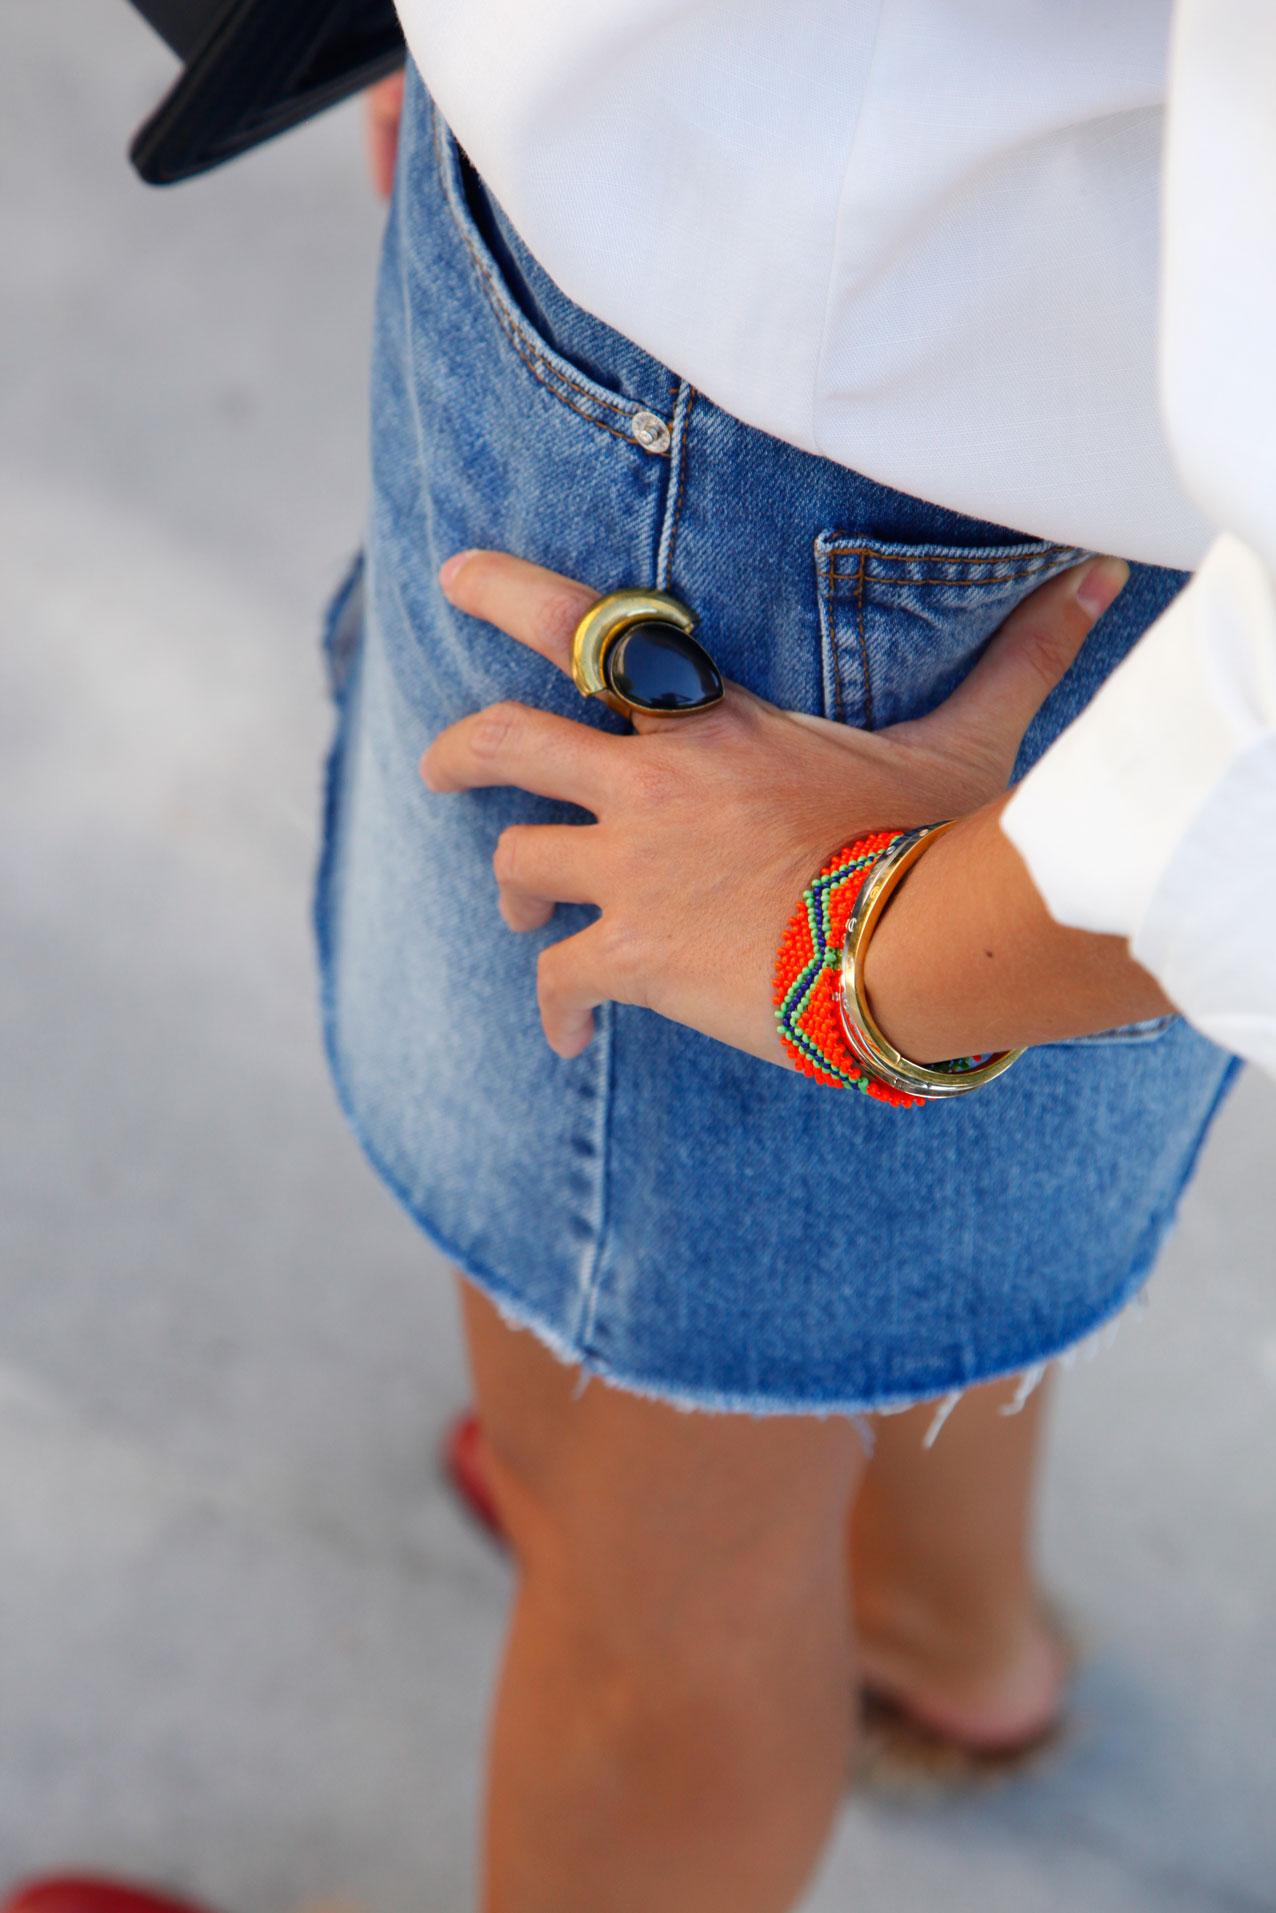 gucci_slippers_adn_denim_skirt_look-cool_lemonade2